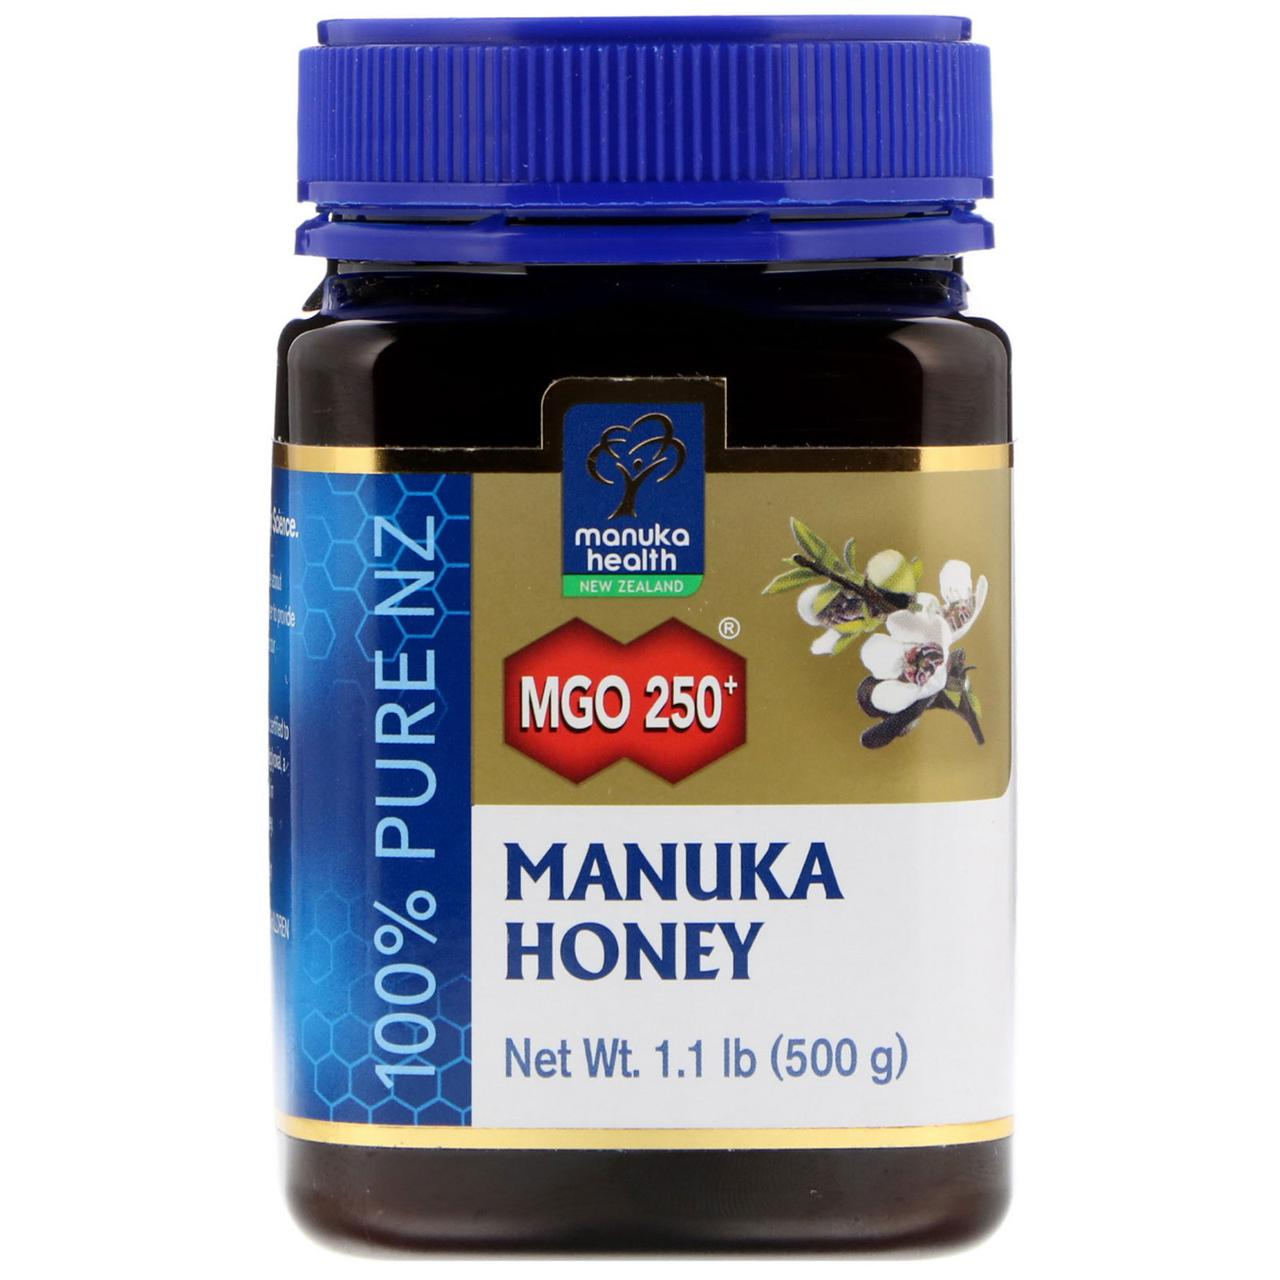 Manuka Health, Лесной мёд манука, MGO 250+, 1,1 фунта (500 г)